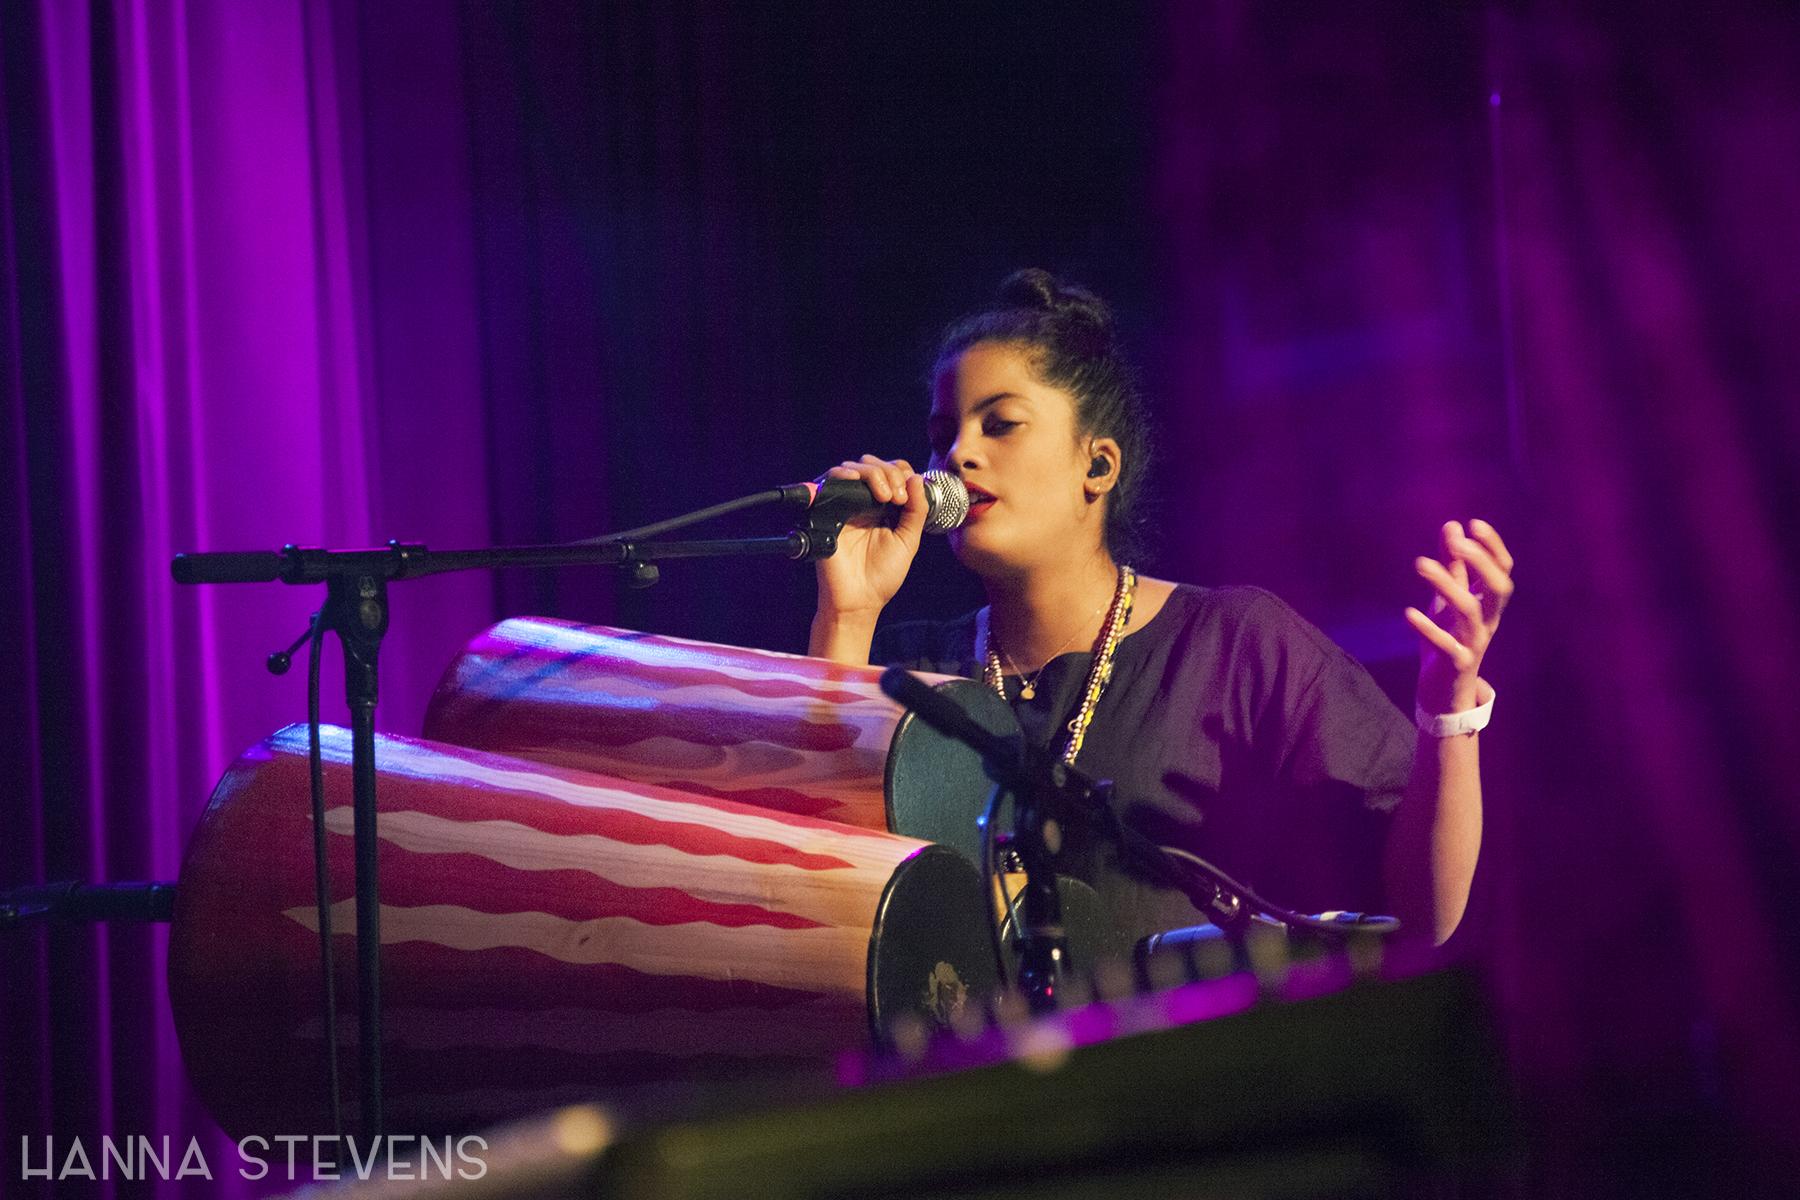 Ibeyi performs at Neumos (Photo by Hanna Stevens)